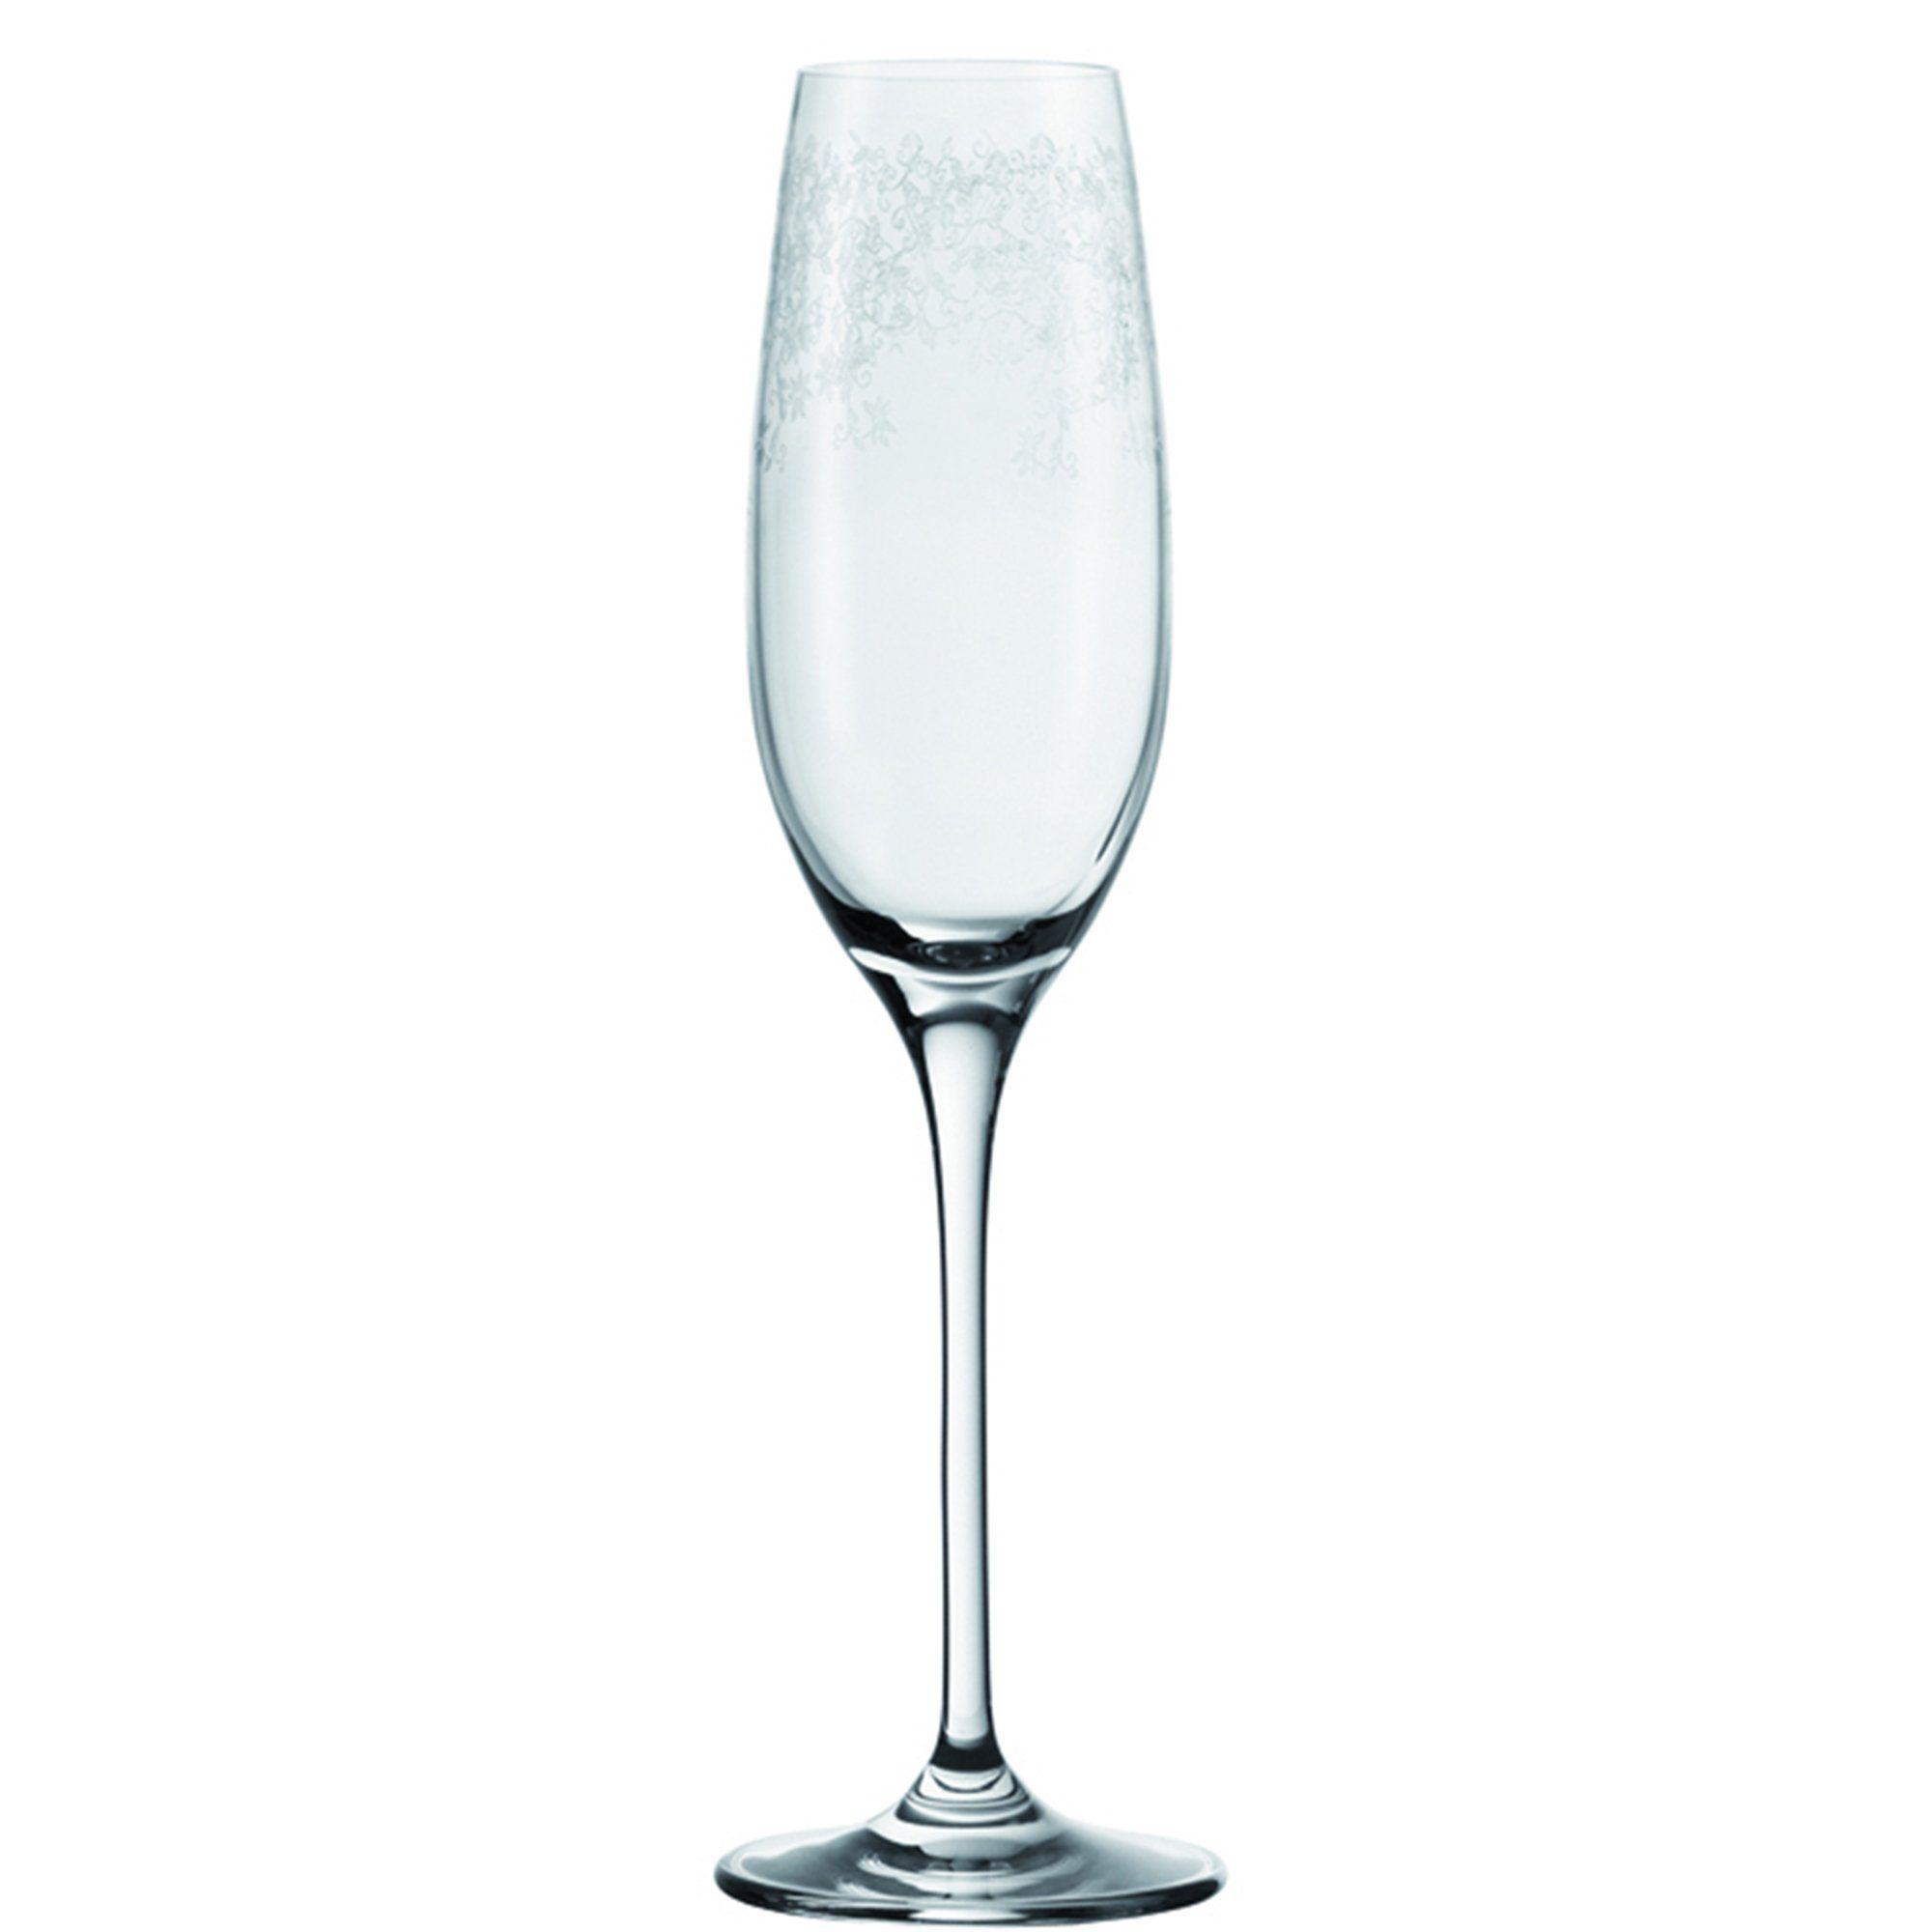 LEONARDO Sekt Glas »Chateau«